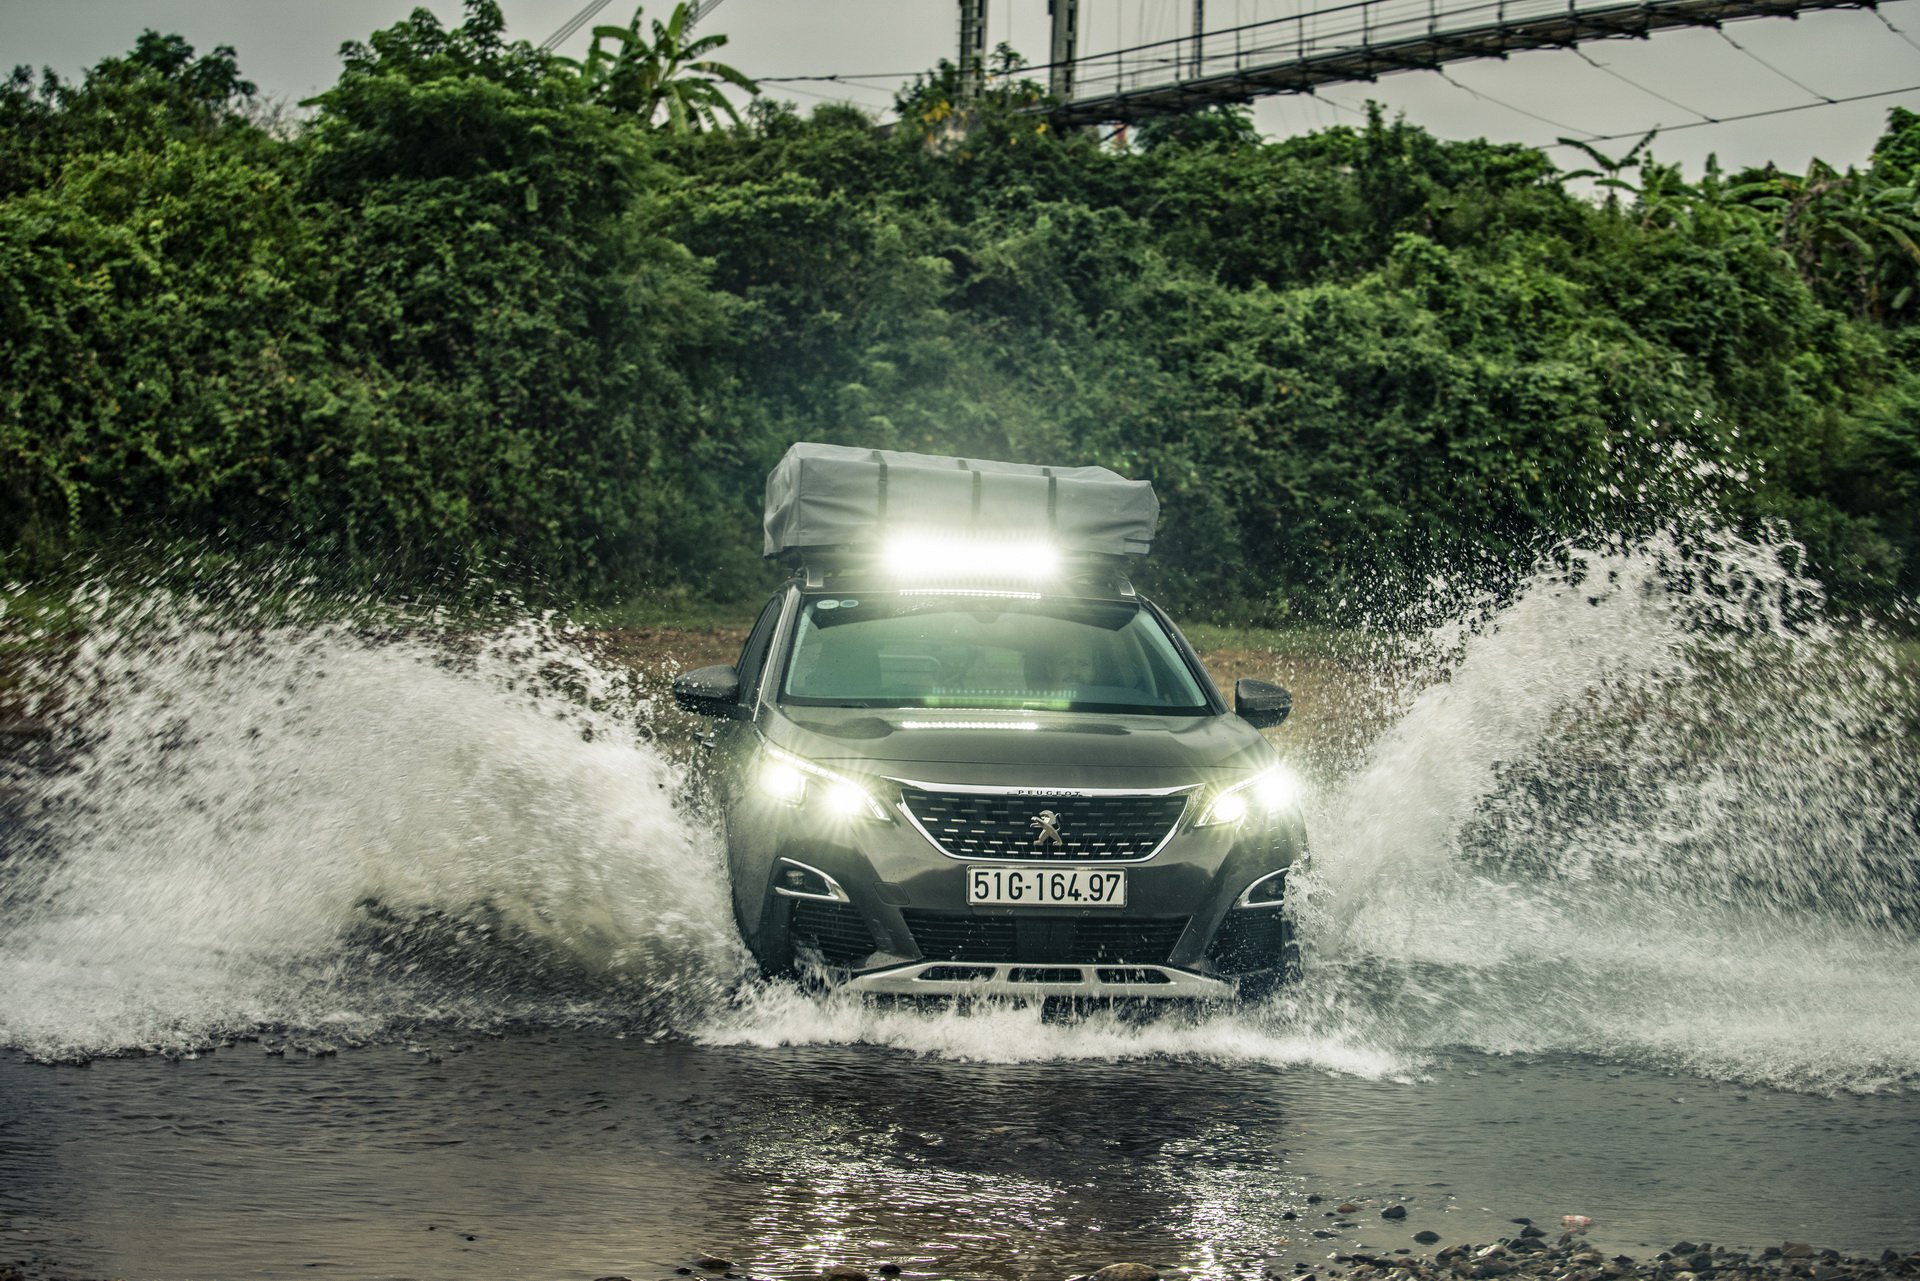 Peugeot-3008-Concept-Vietnam-Adventure-4